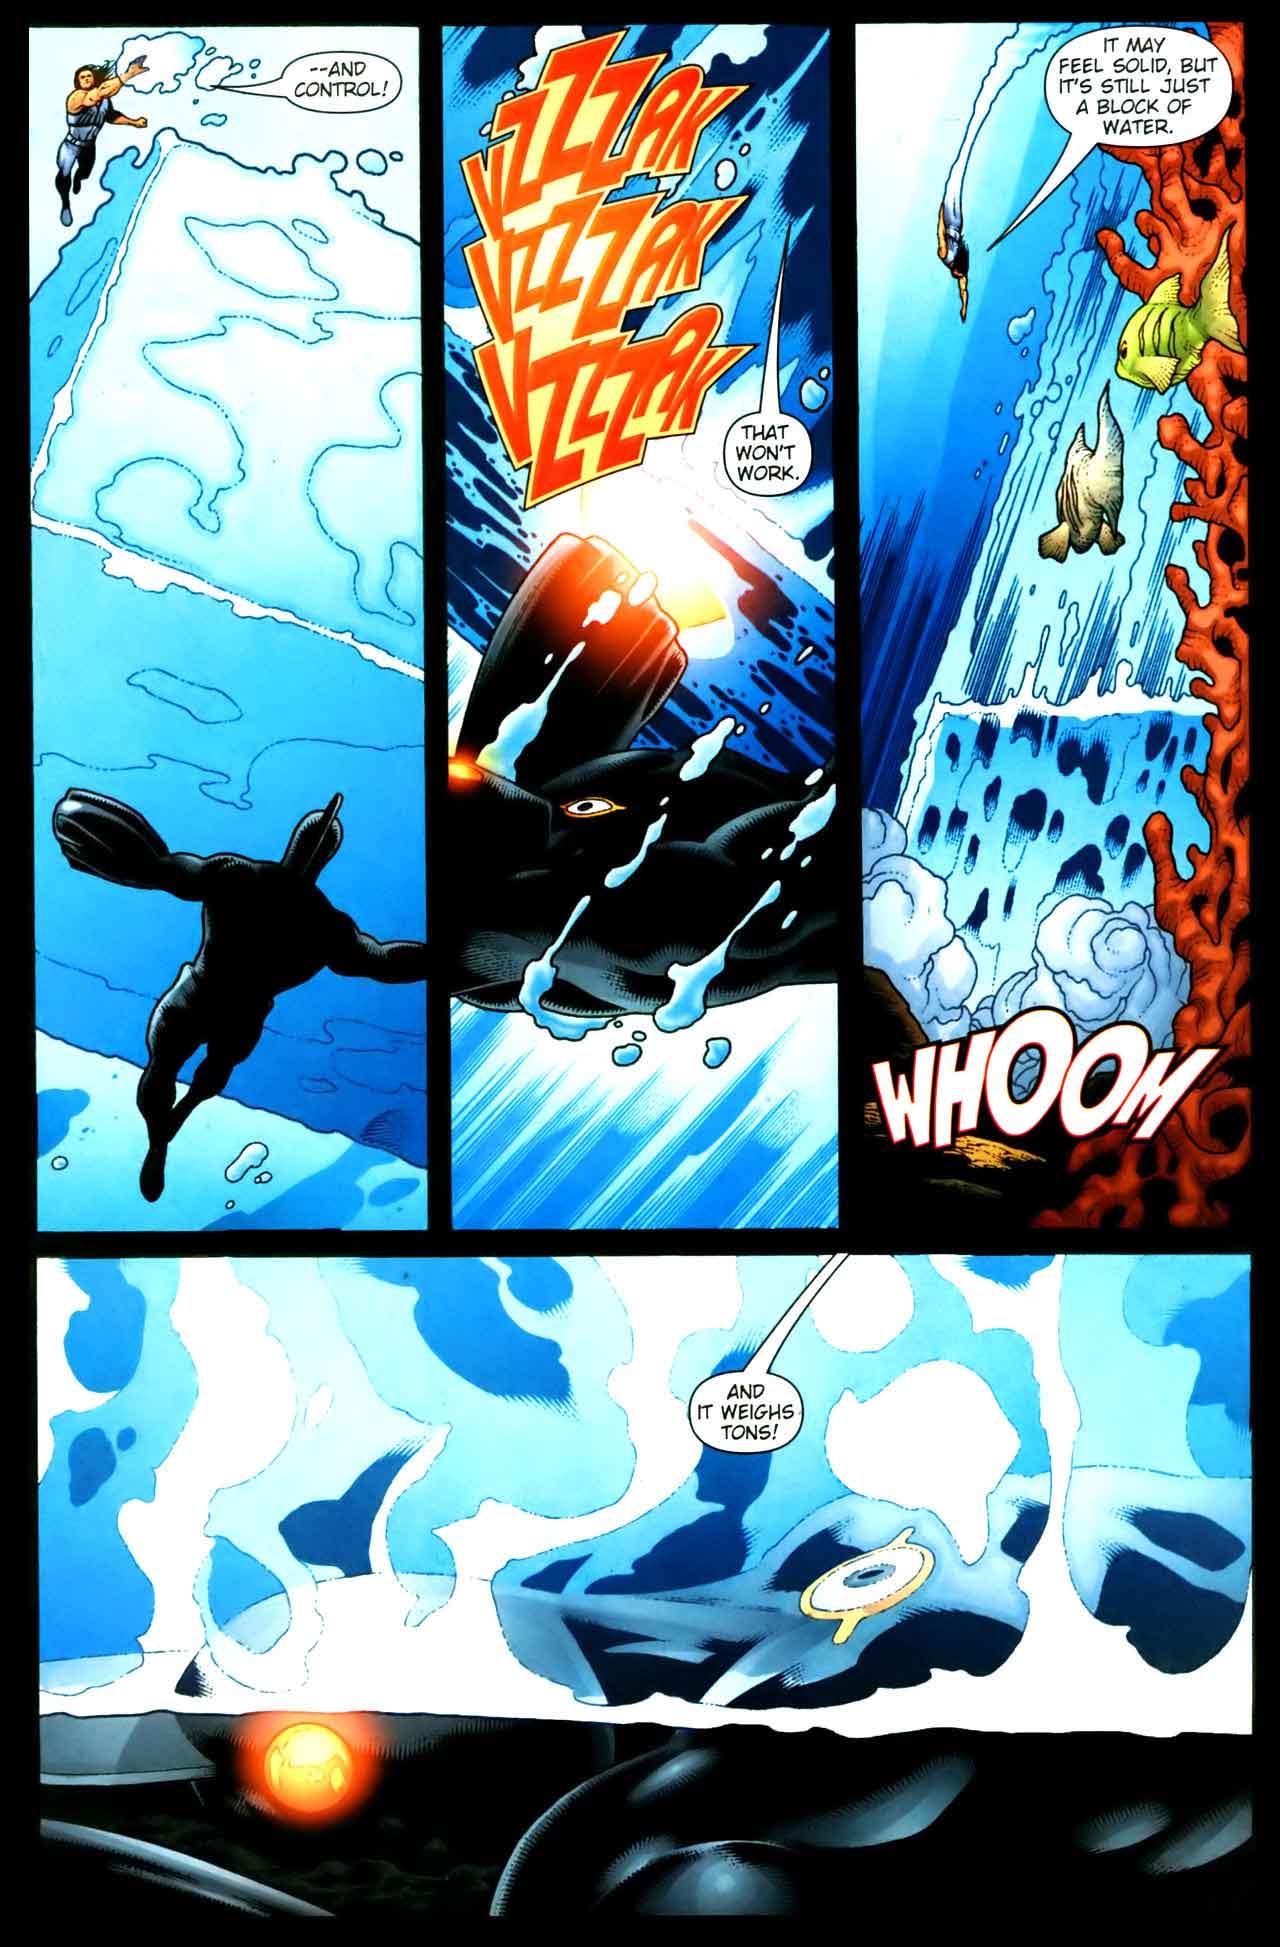 AQUAMAN #35 by John Arcudi, Leonard Kirk, and Andy Clarke